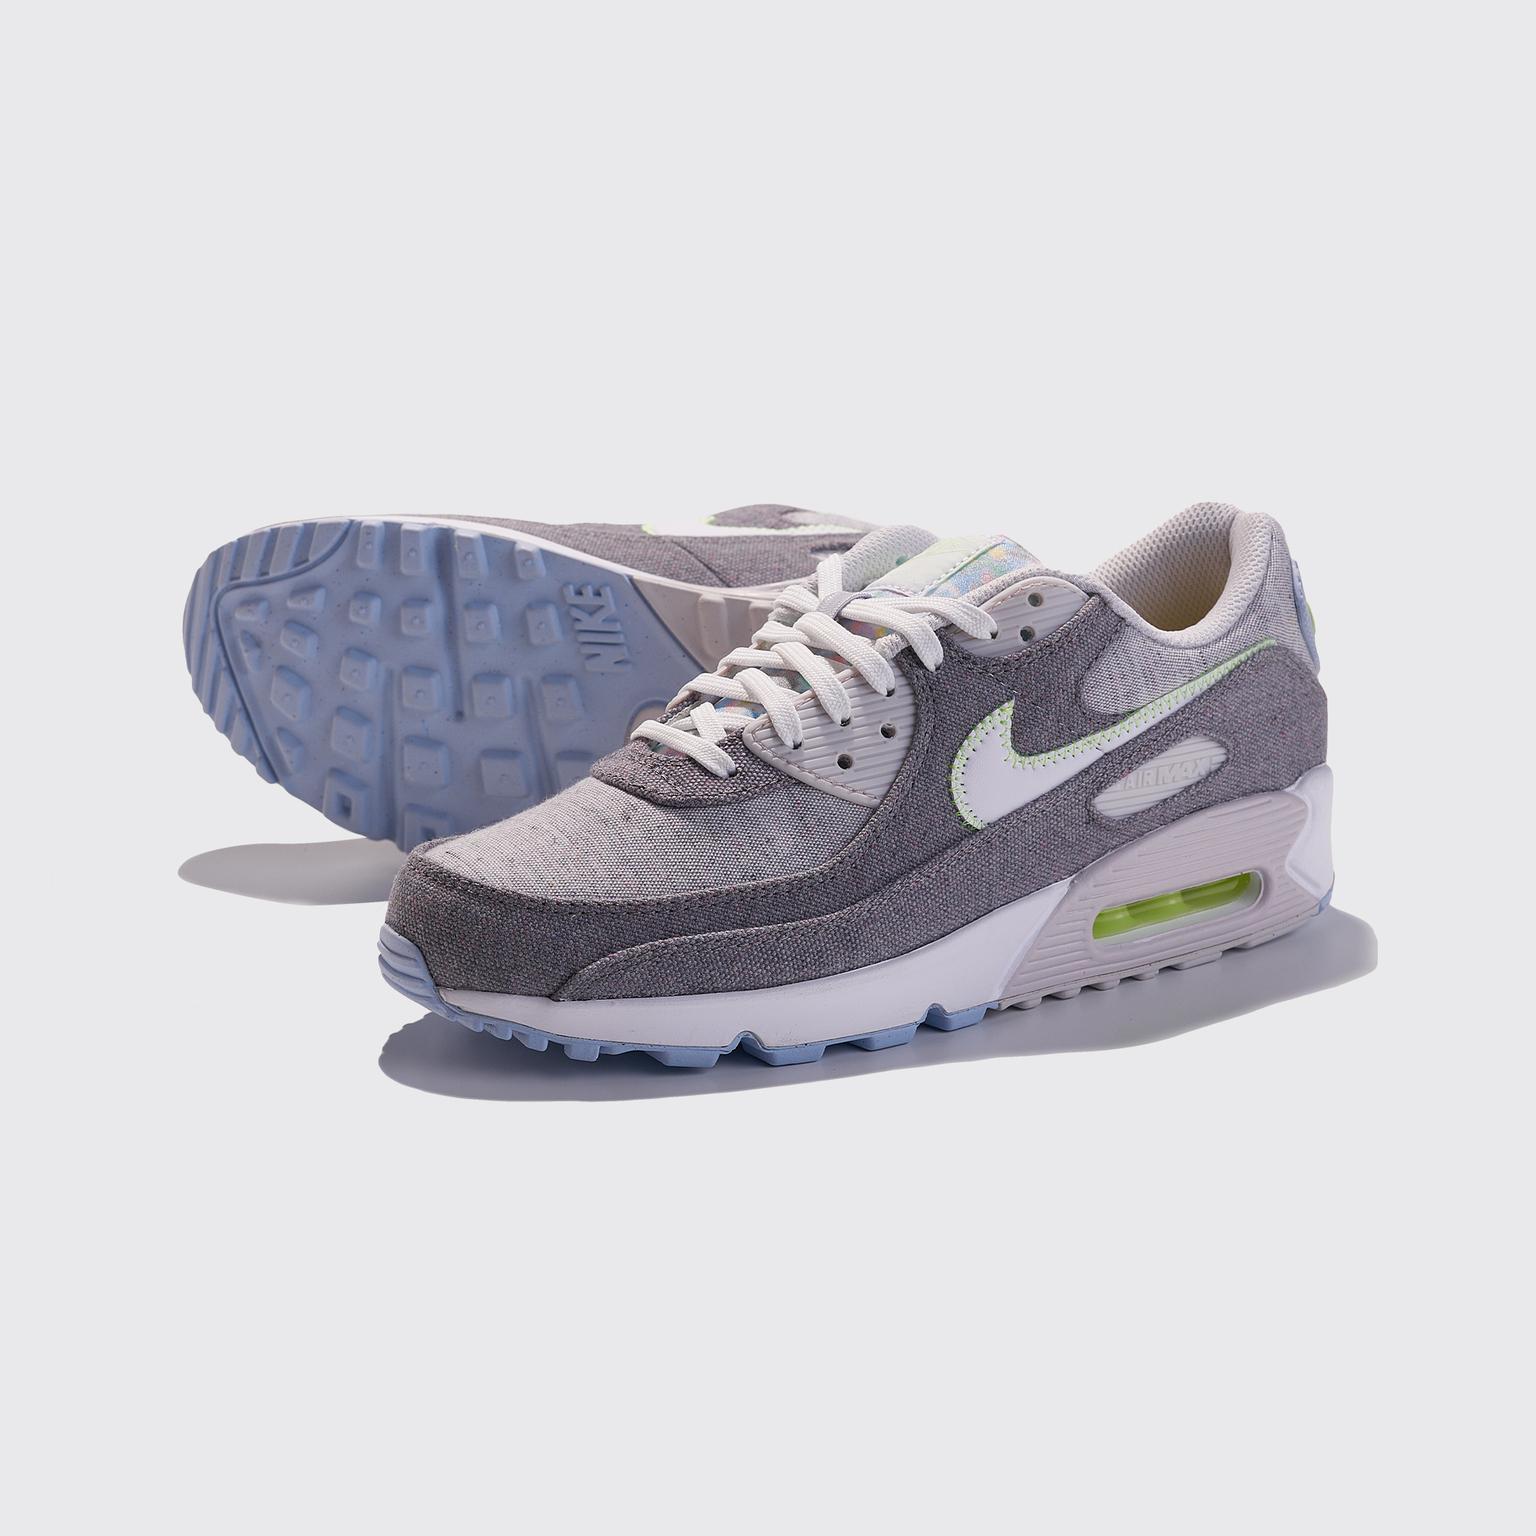 Кроссовки Nike Air Max 90 NRG CK6467-001